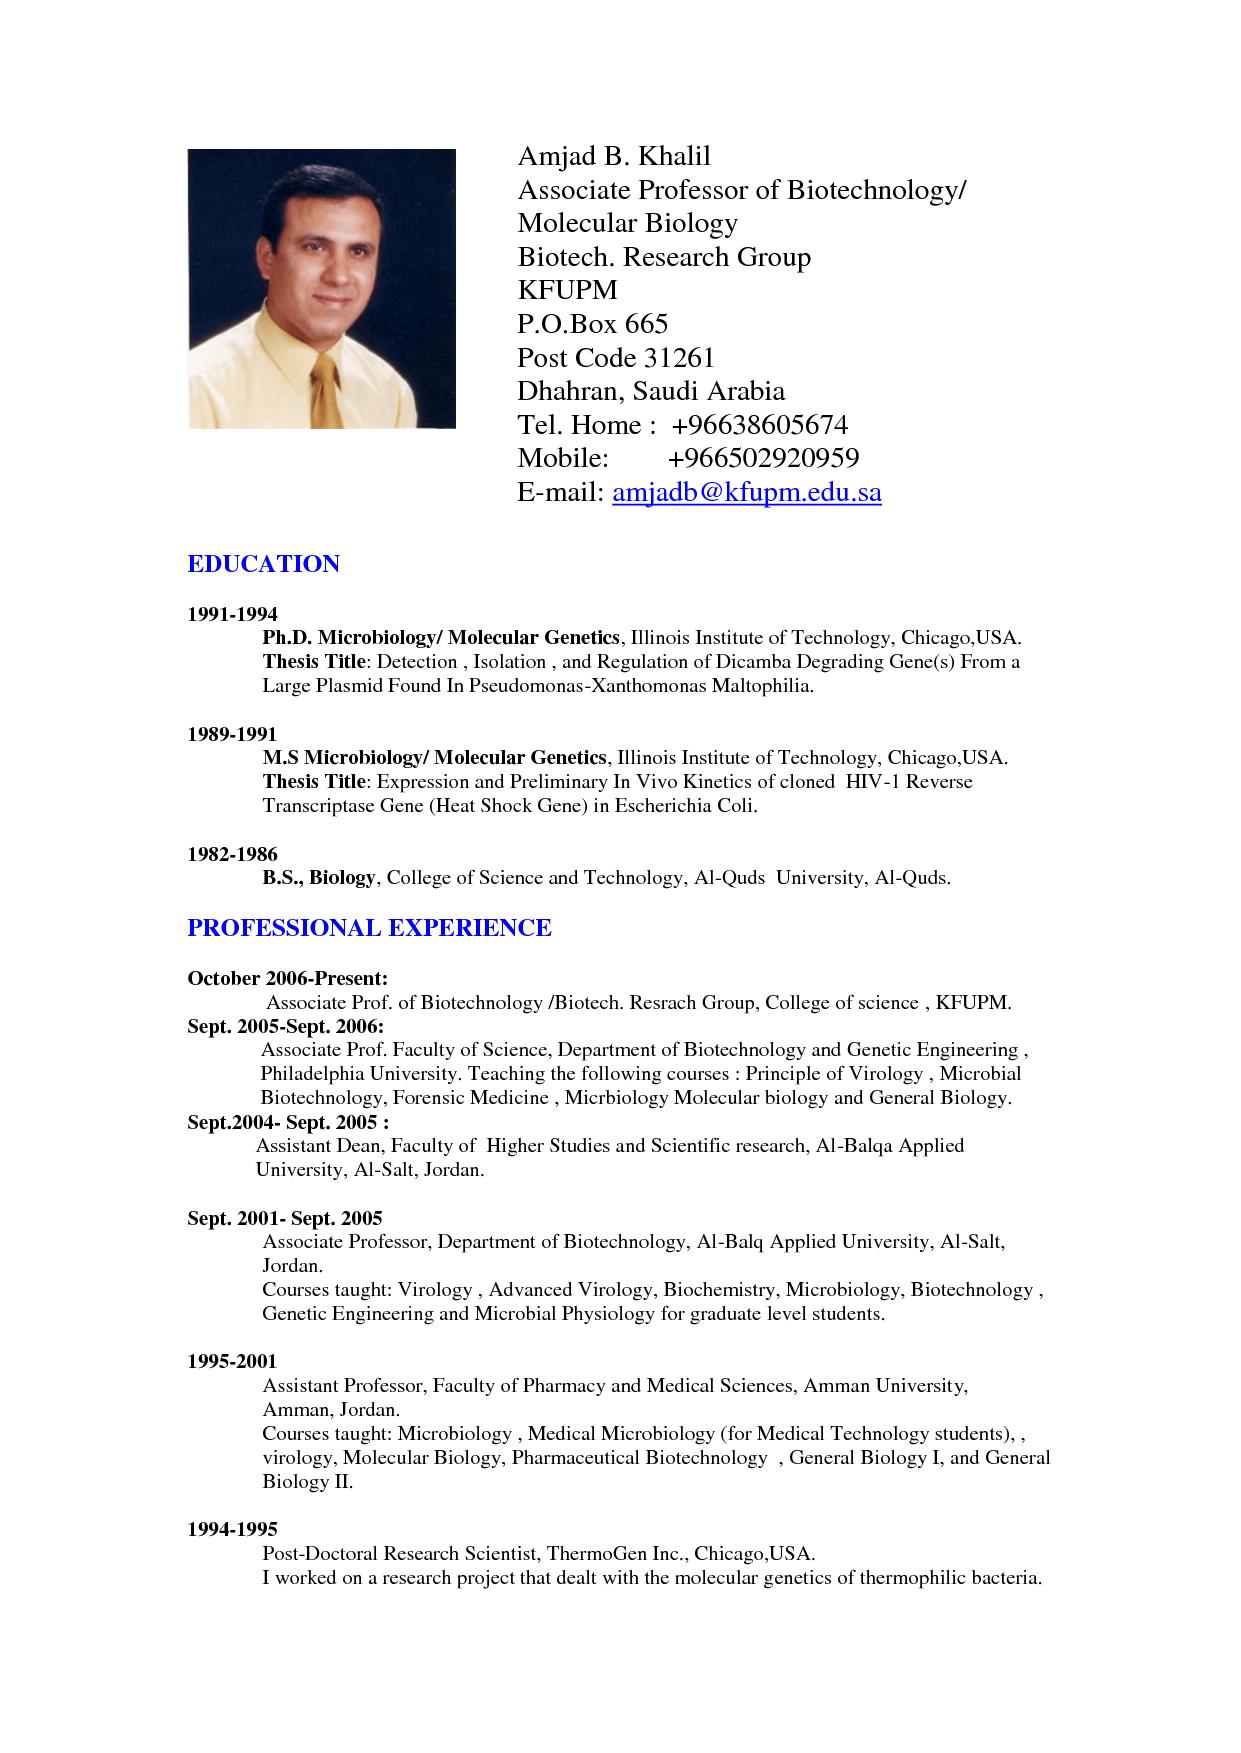 Doc Professional resume format, Job resume format, Job